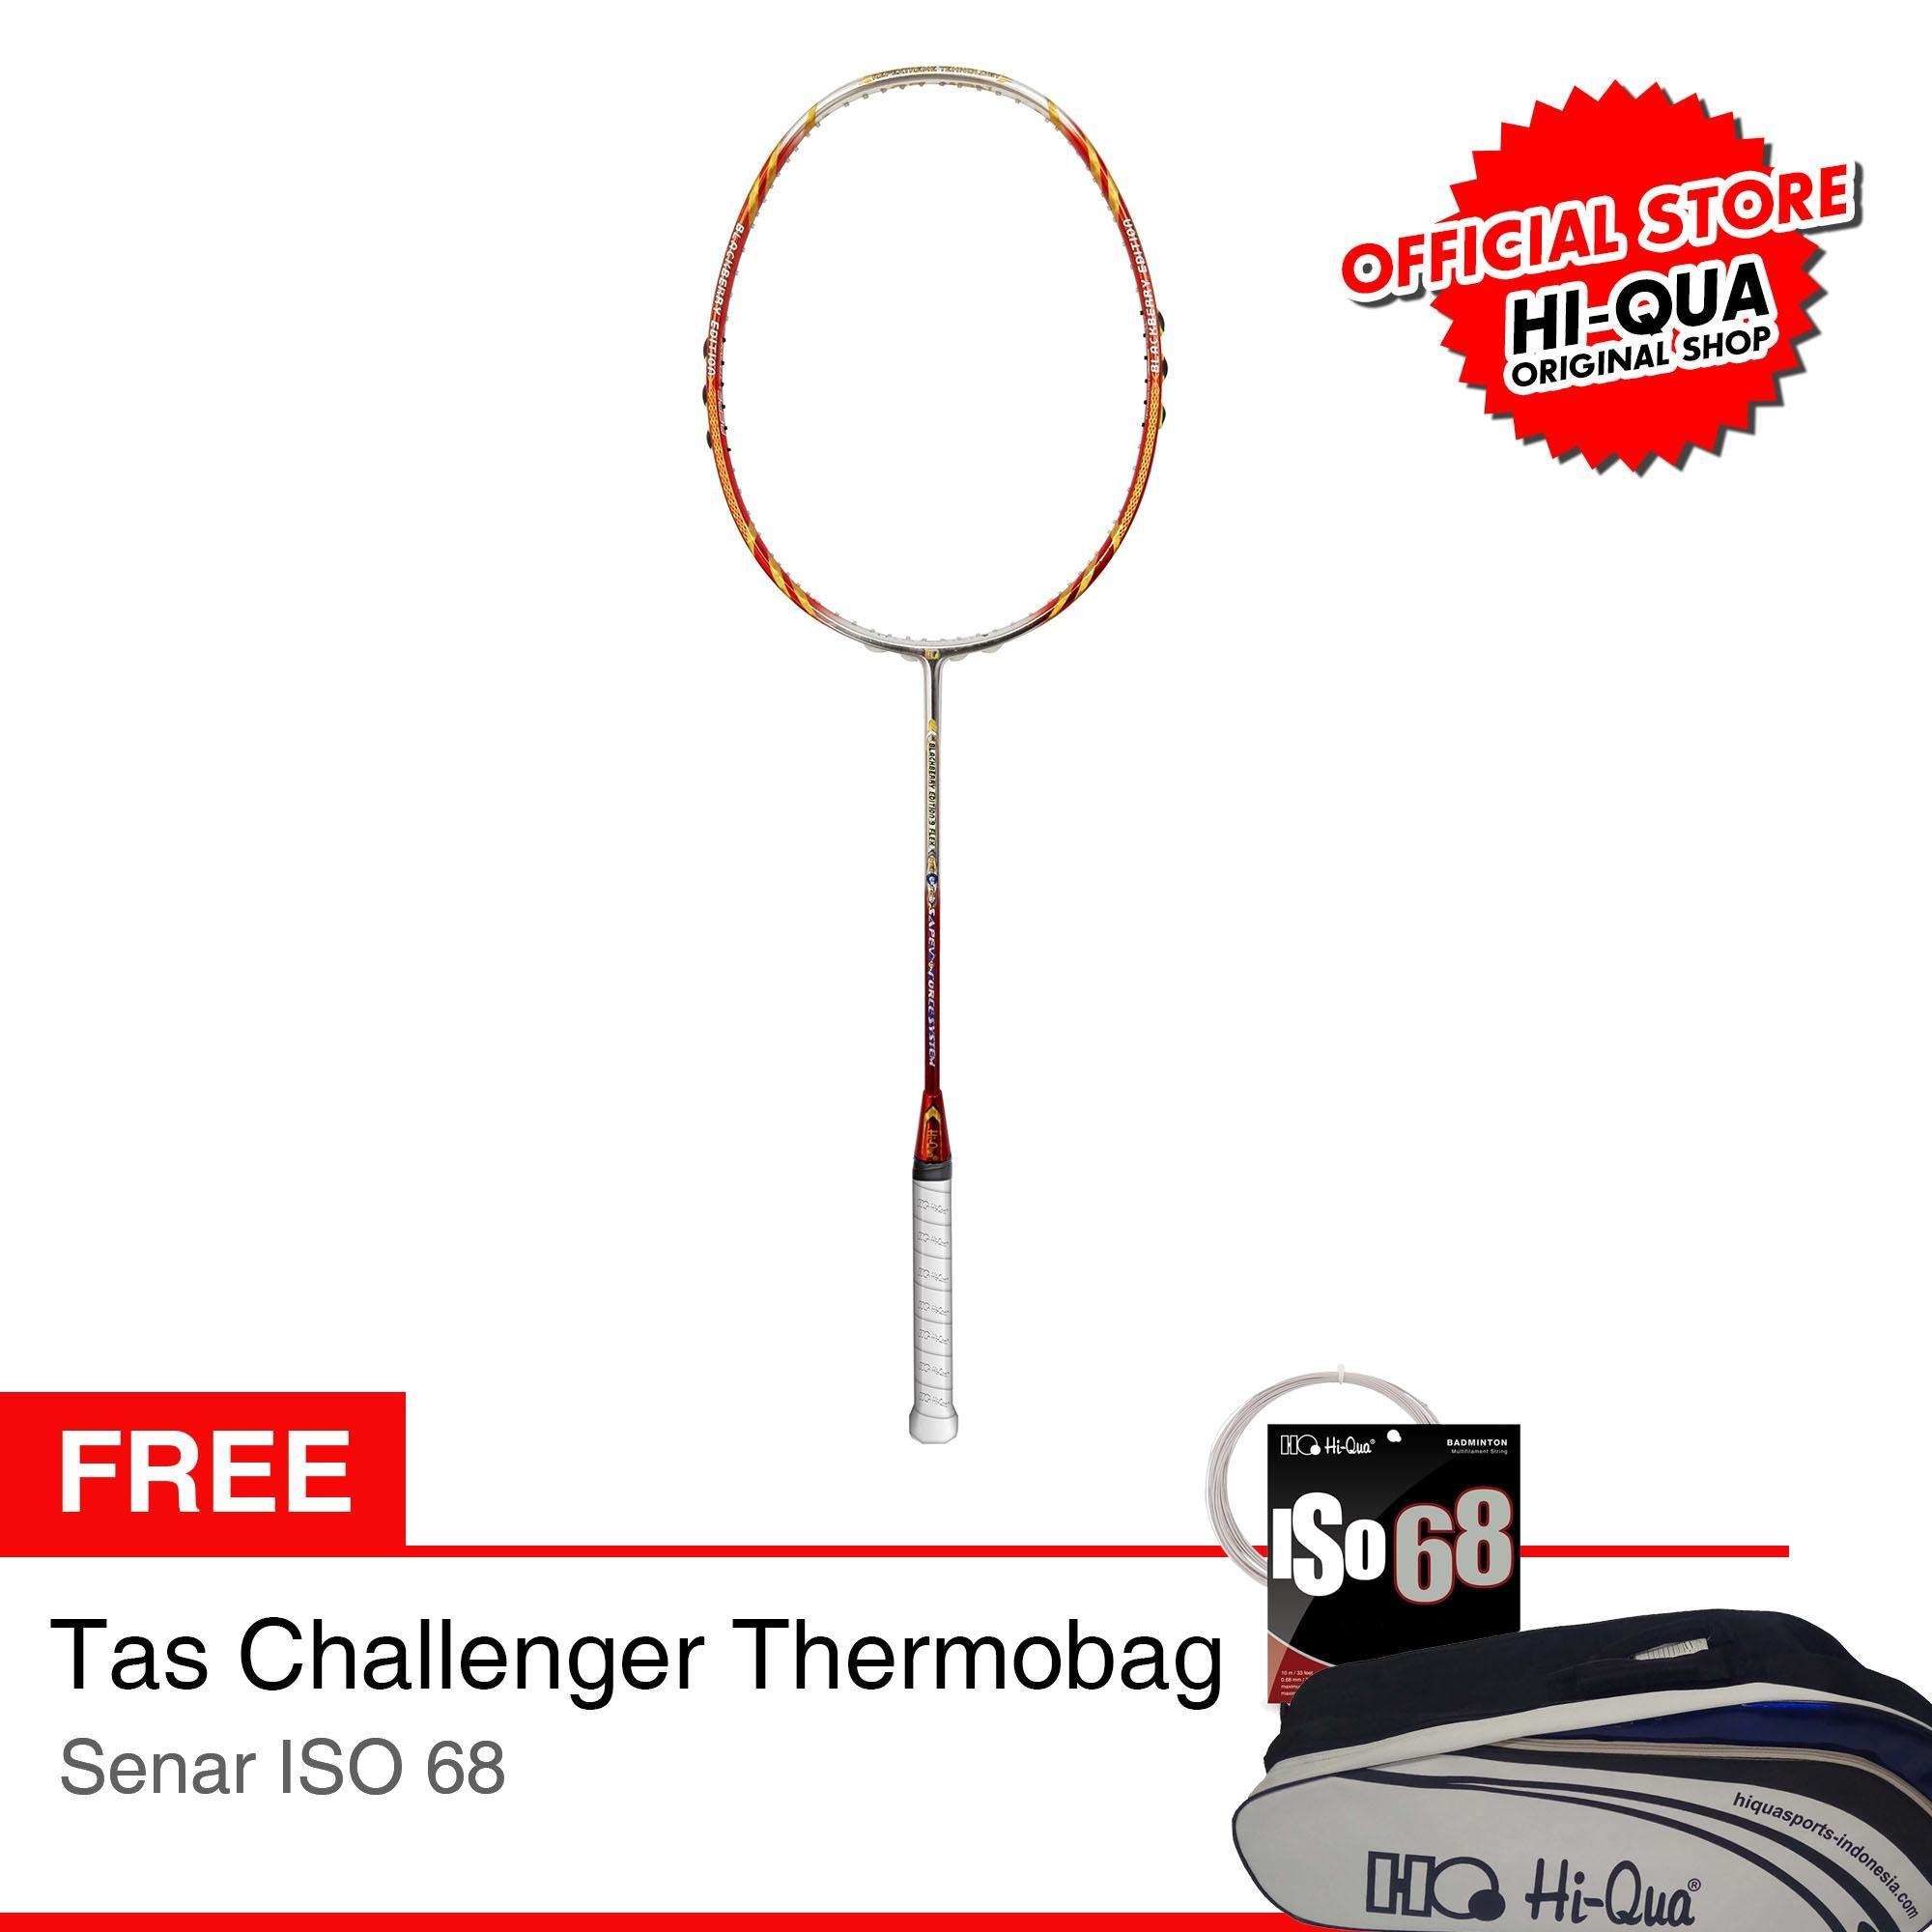 [PAKET LIMITED EDITION] Hi-Qua Raket Bulutangkis / Badminton BB Edition 09 Flex